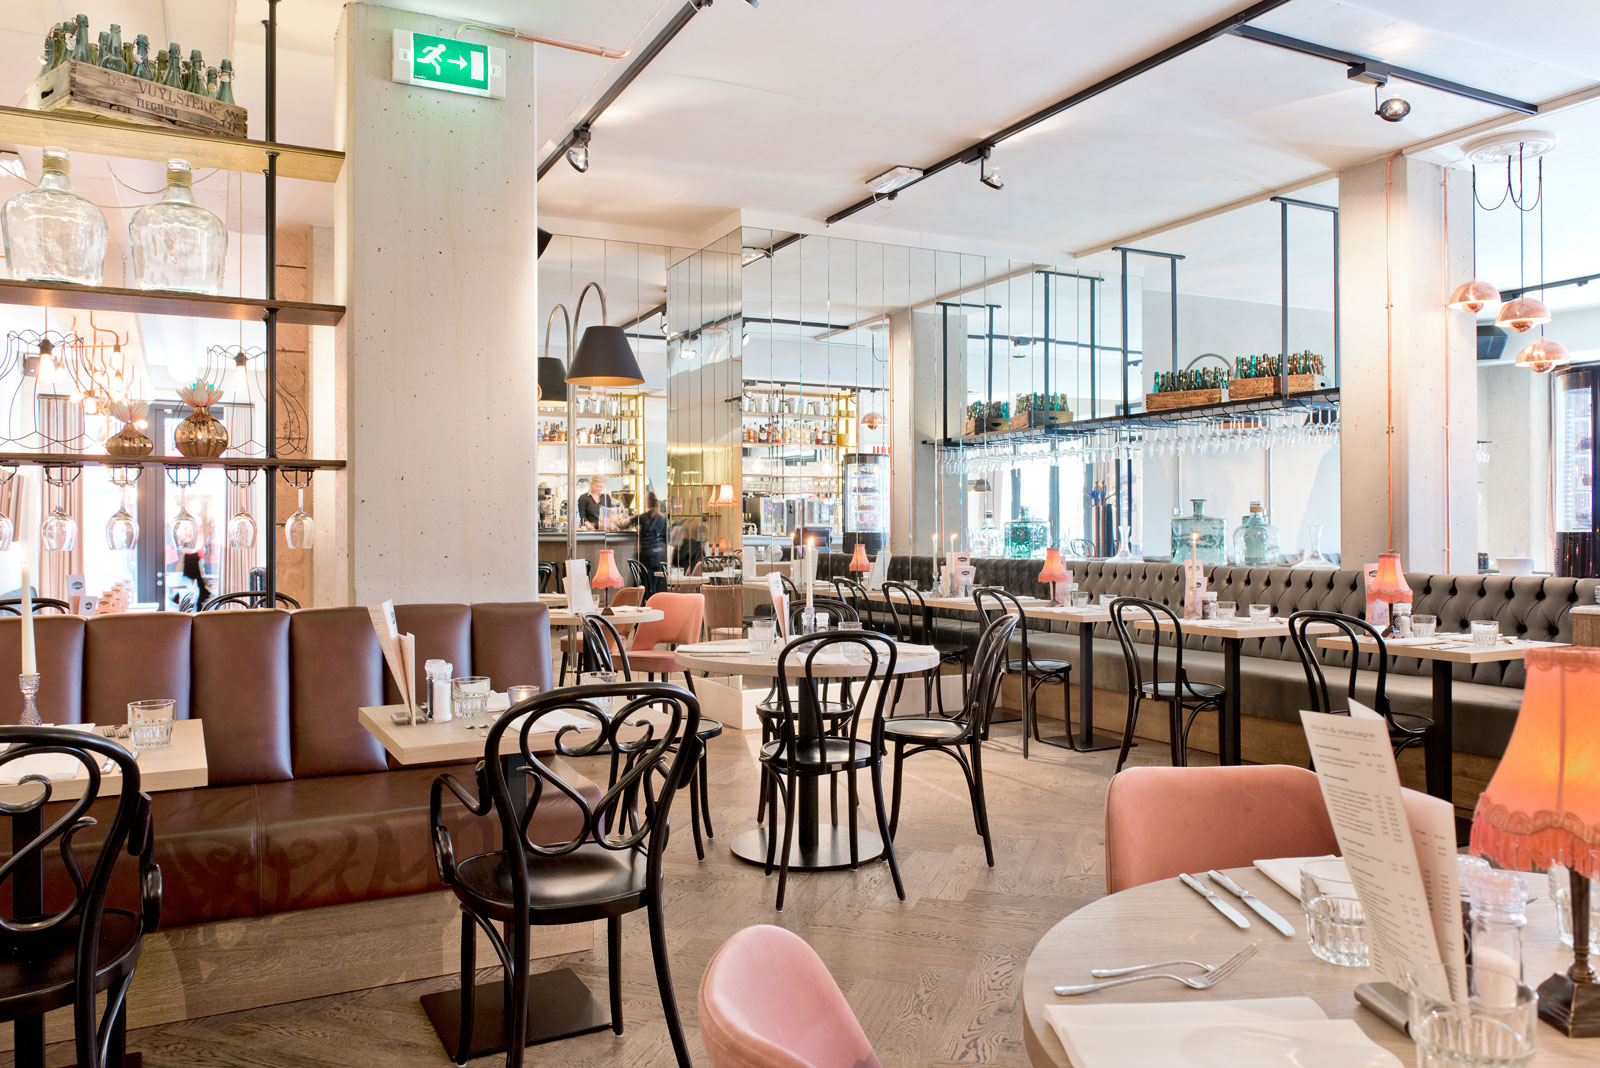 3642b67b f88a 42a6 8b88 74757831acd4 dsc0065 copy Brasserie Bardot Restaurant